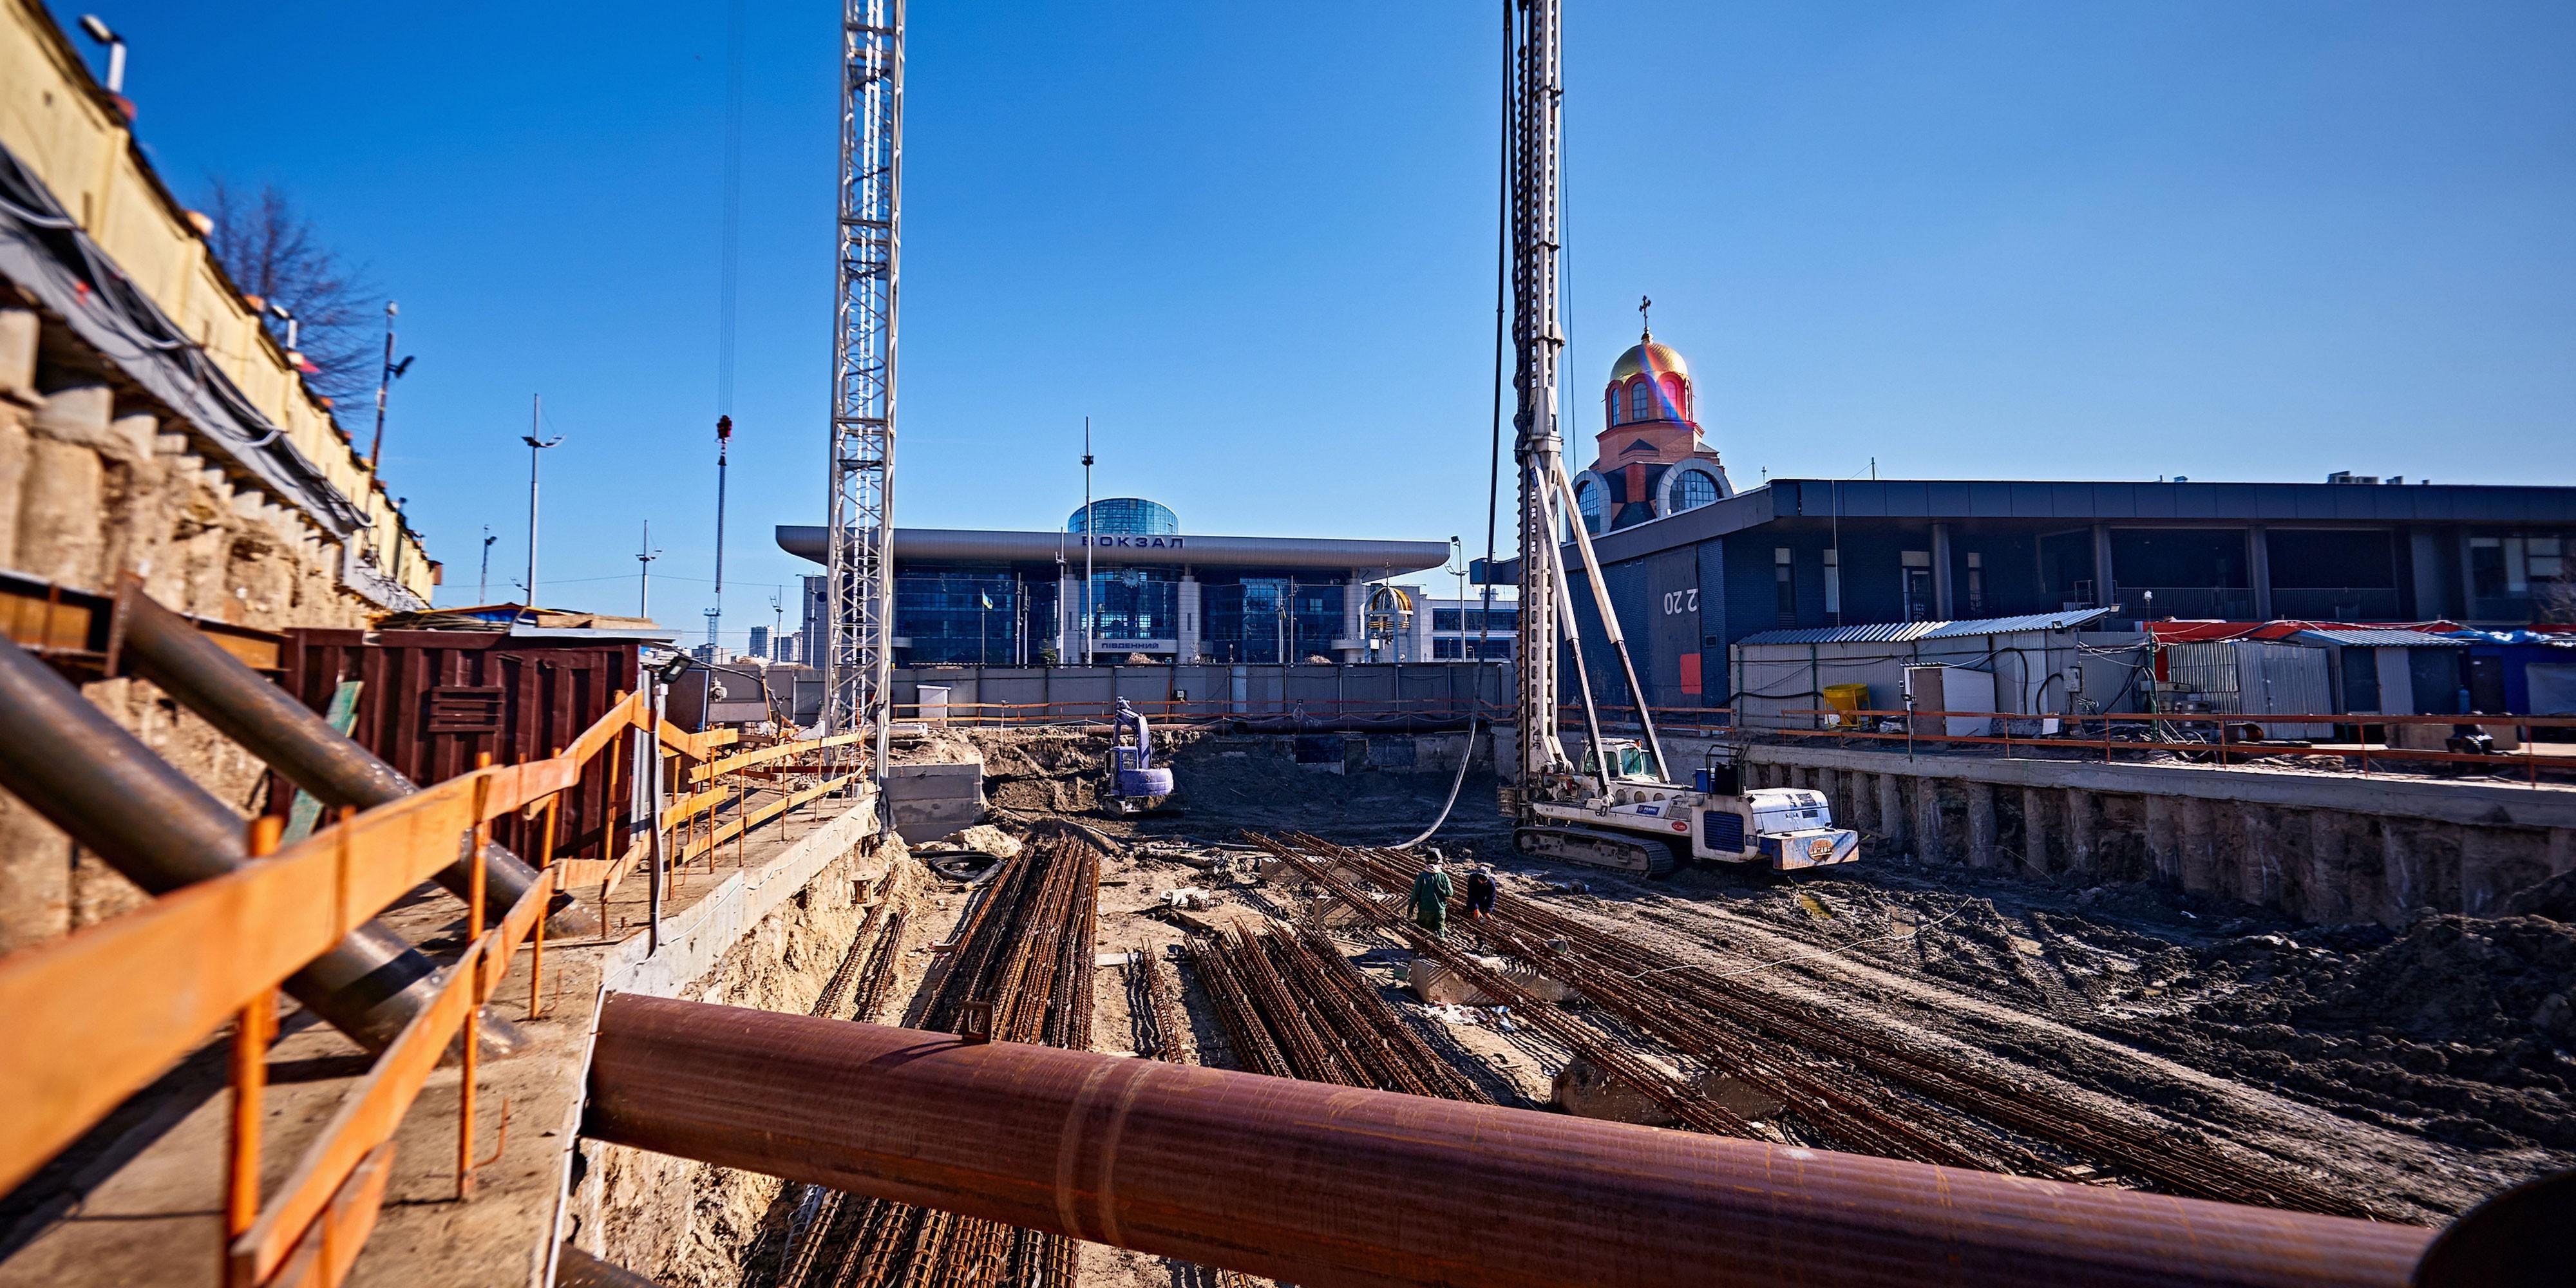 S1 Terminal construction progress. April 2020